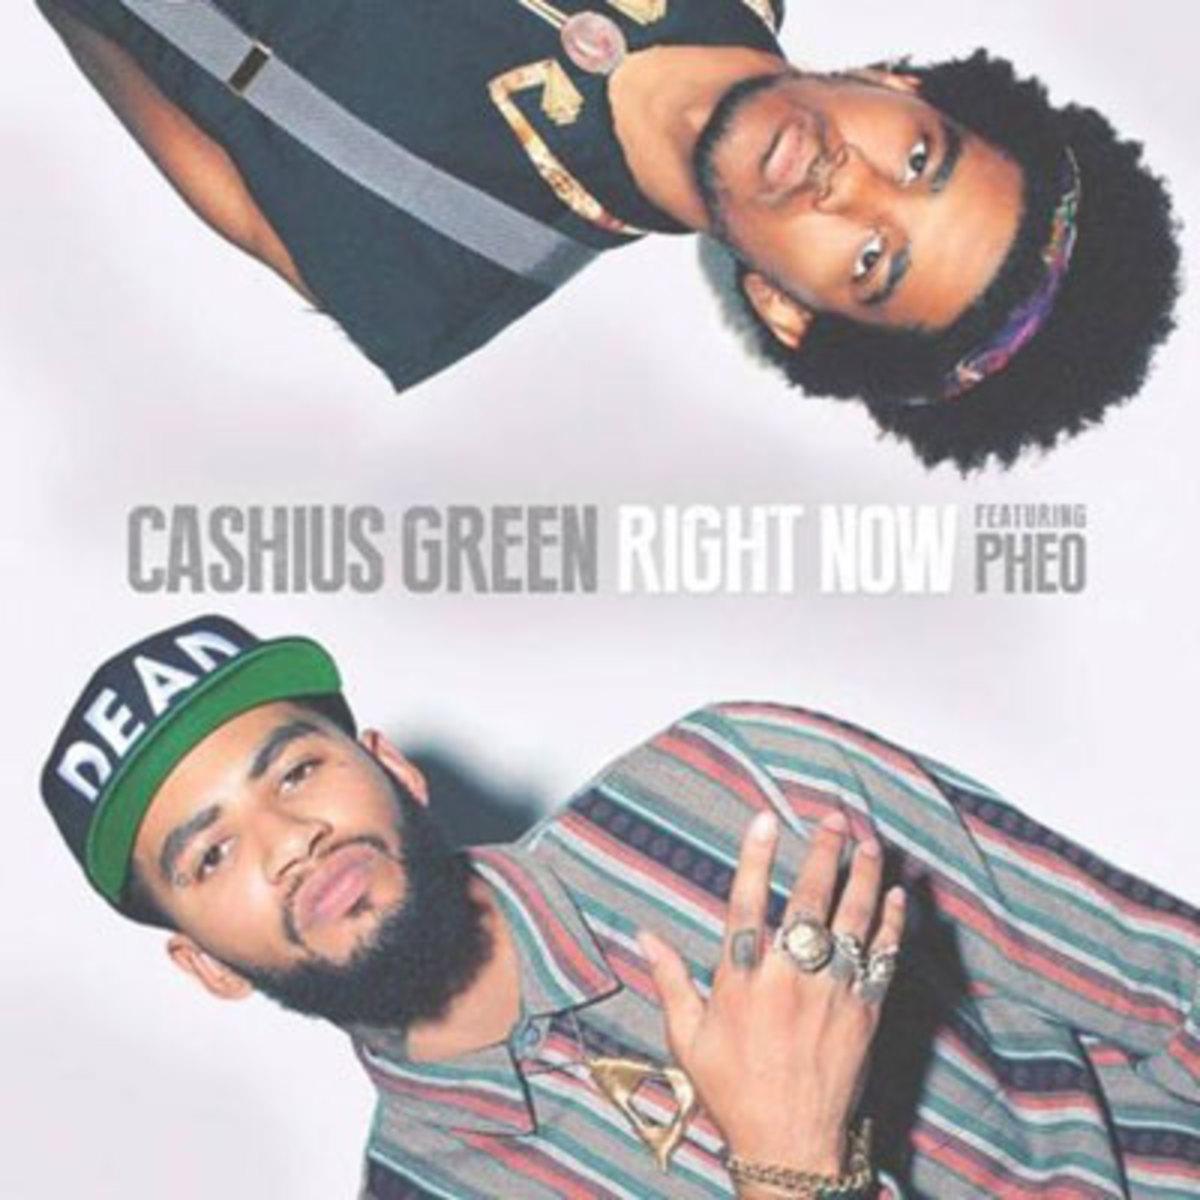 cashiusgreen-rightnow.jpg